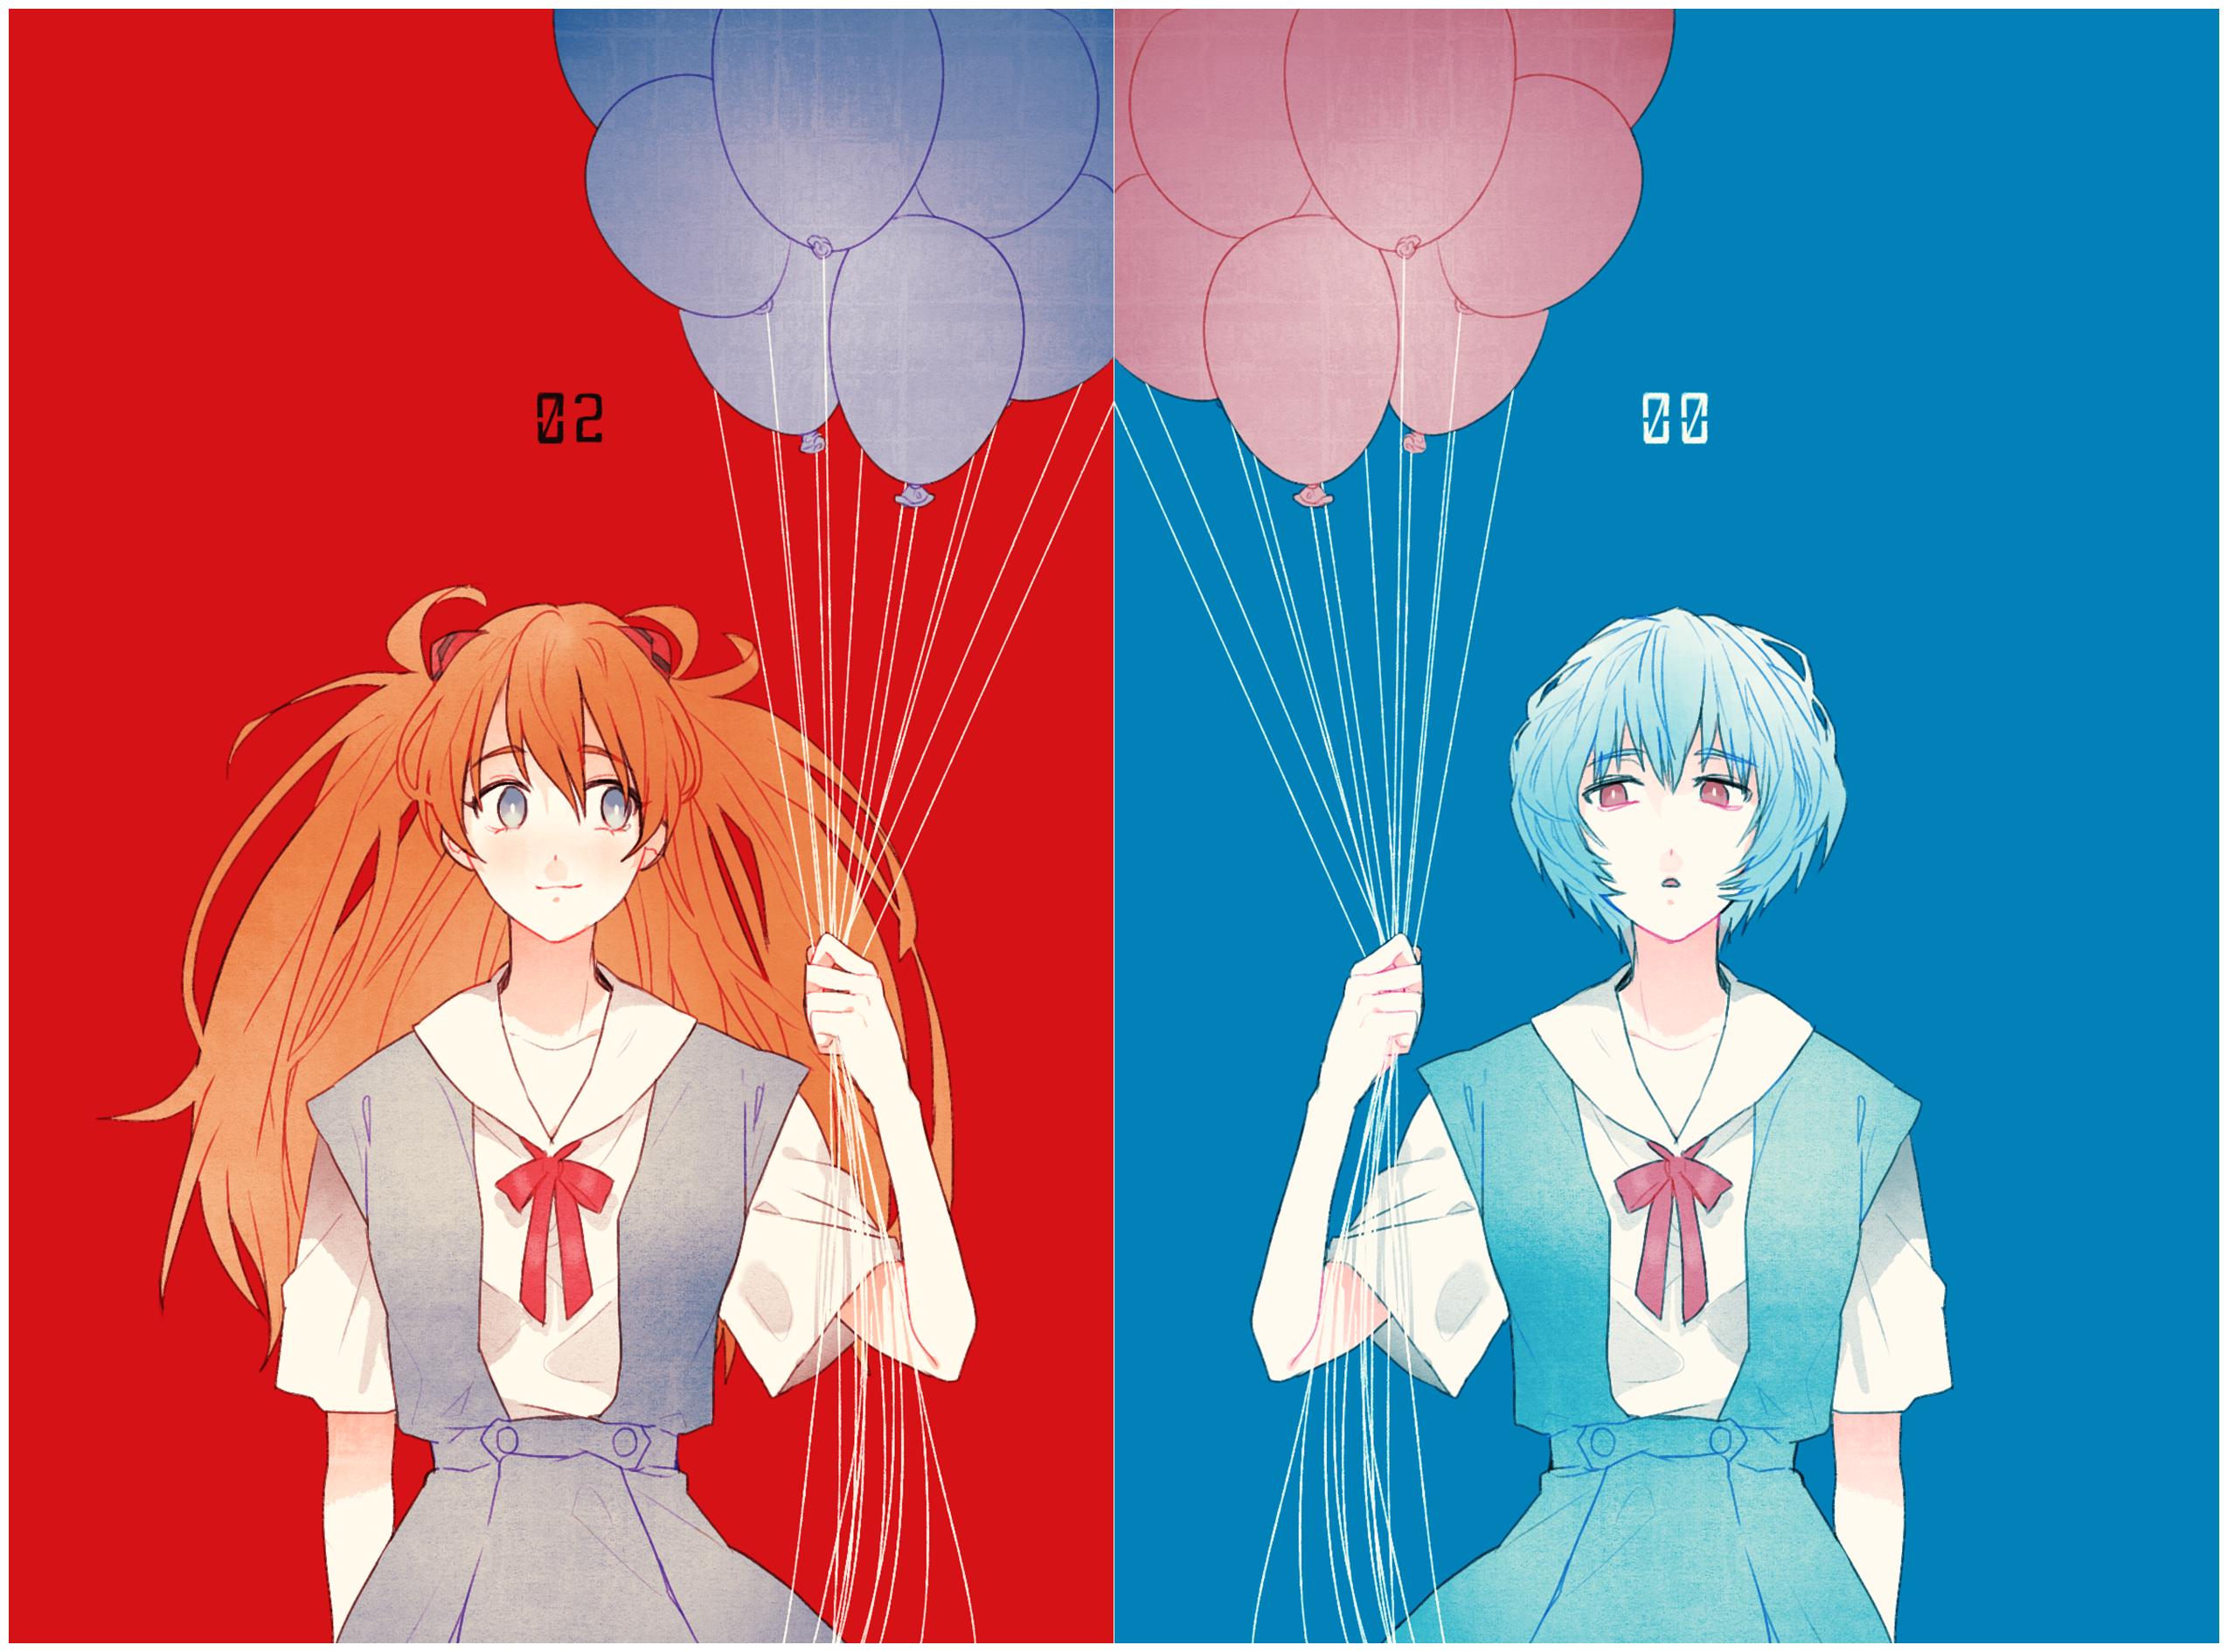 Anime 2549x1890 Neon Genesis Evangelion anime girls Ayanami Rei Asuka Langley Soryu